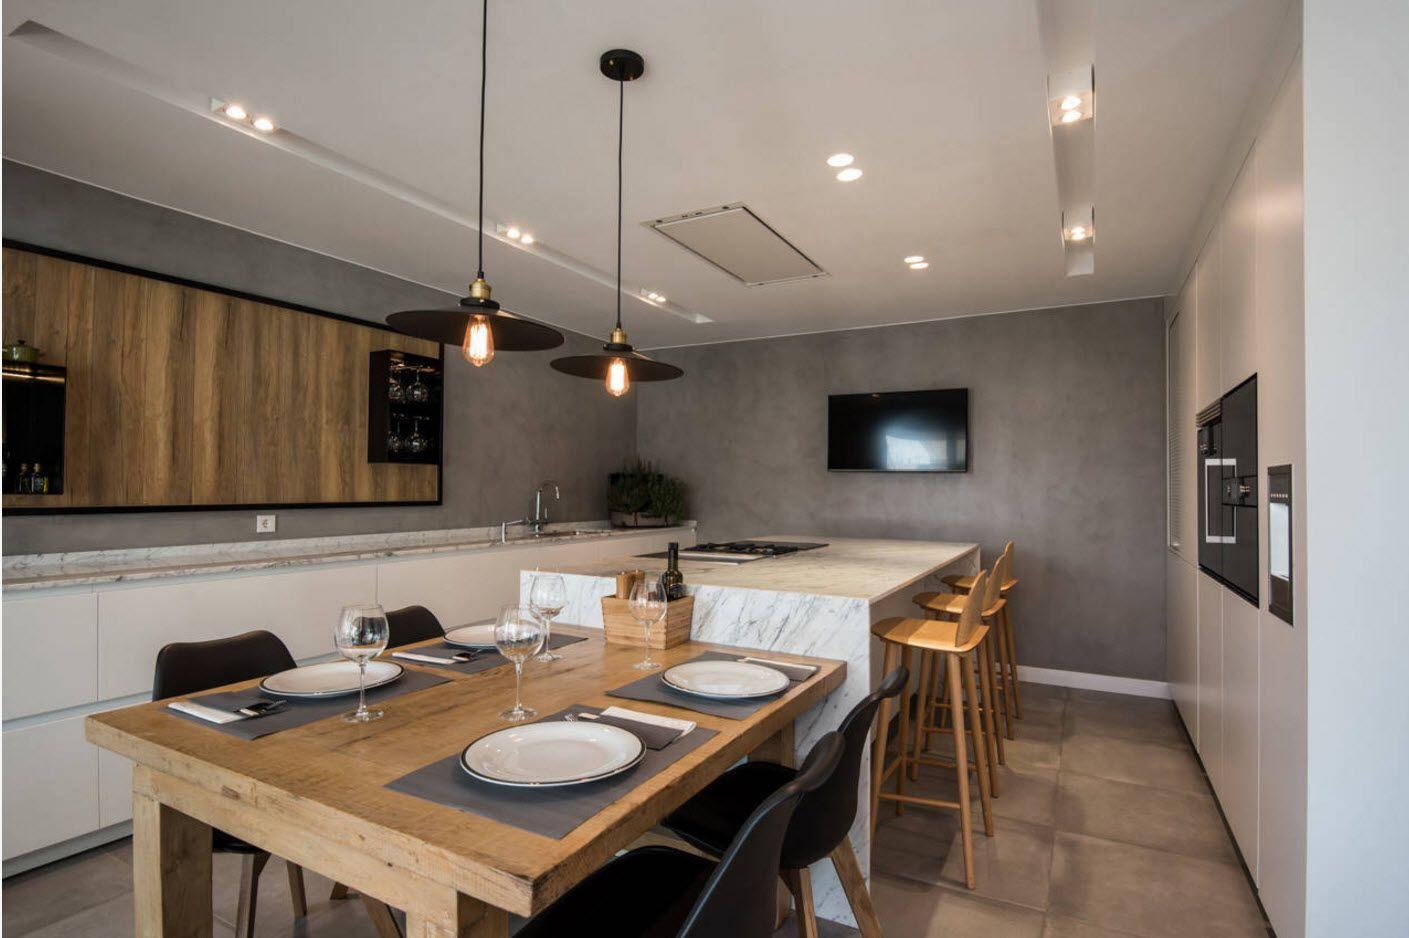 Scandinavian modernity at the cottage kitchen in dark gray color scheme